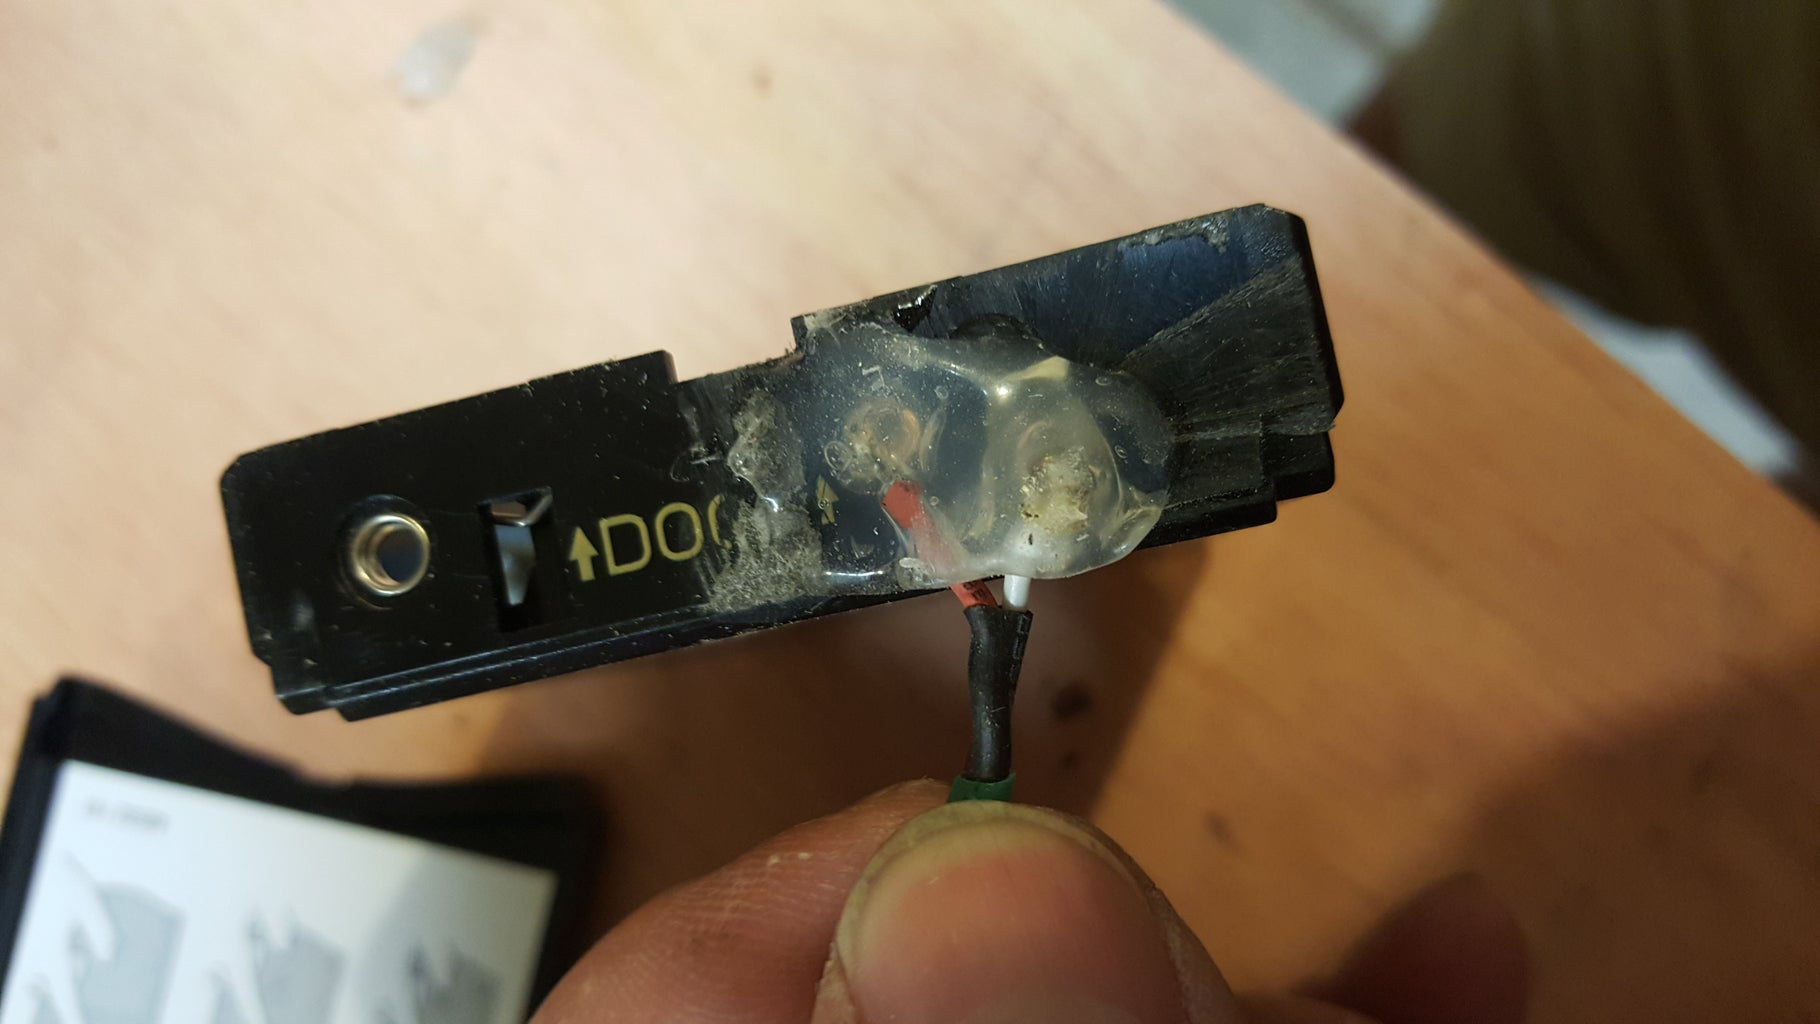 Modify the Battery Compartment.